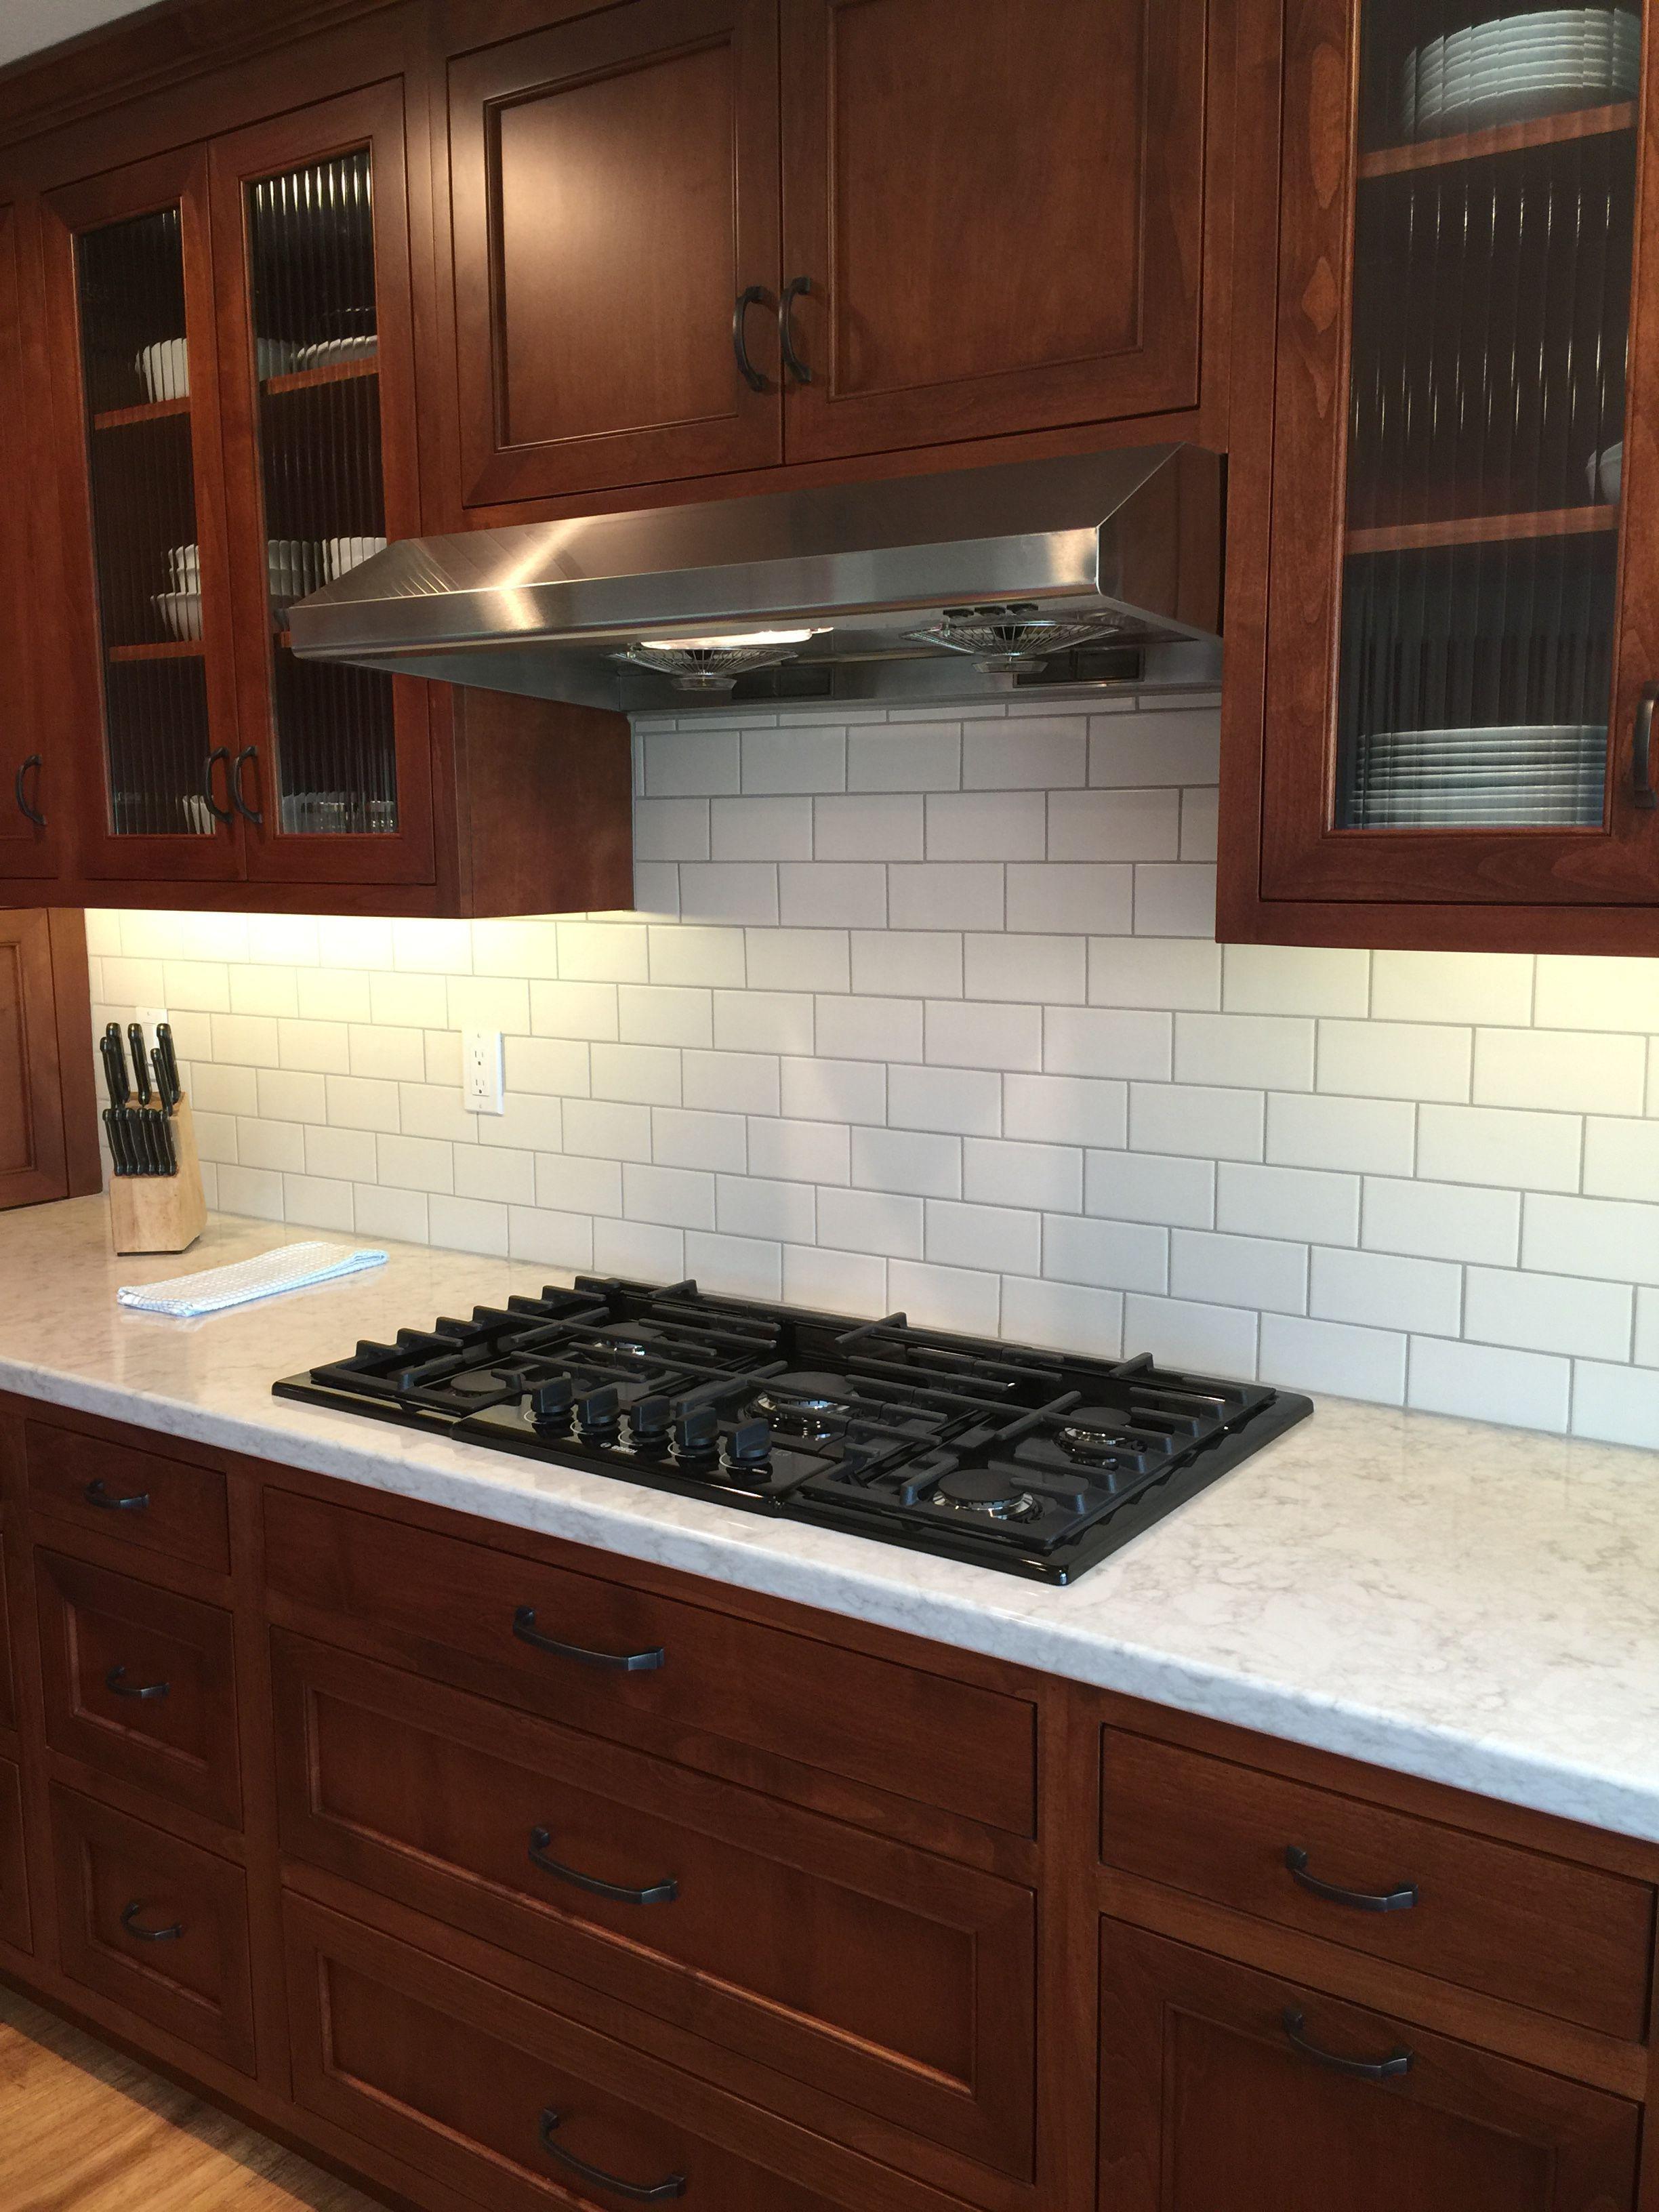 Eye Opening Diy Ideas Gray Tile Backsplash Arabesque Backsplash Style Metal Backspl Cherry Cabinets Kitchen Easy Kitchen Backsplash Kitchen Backsplash Designs